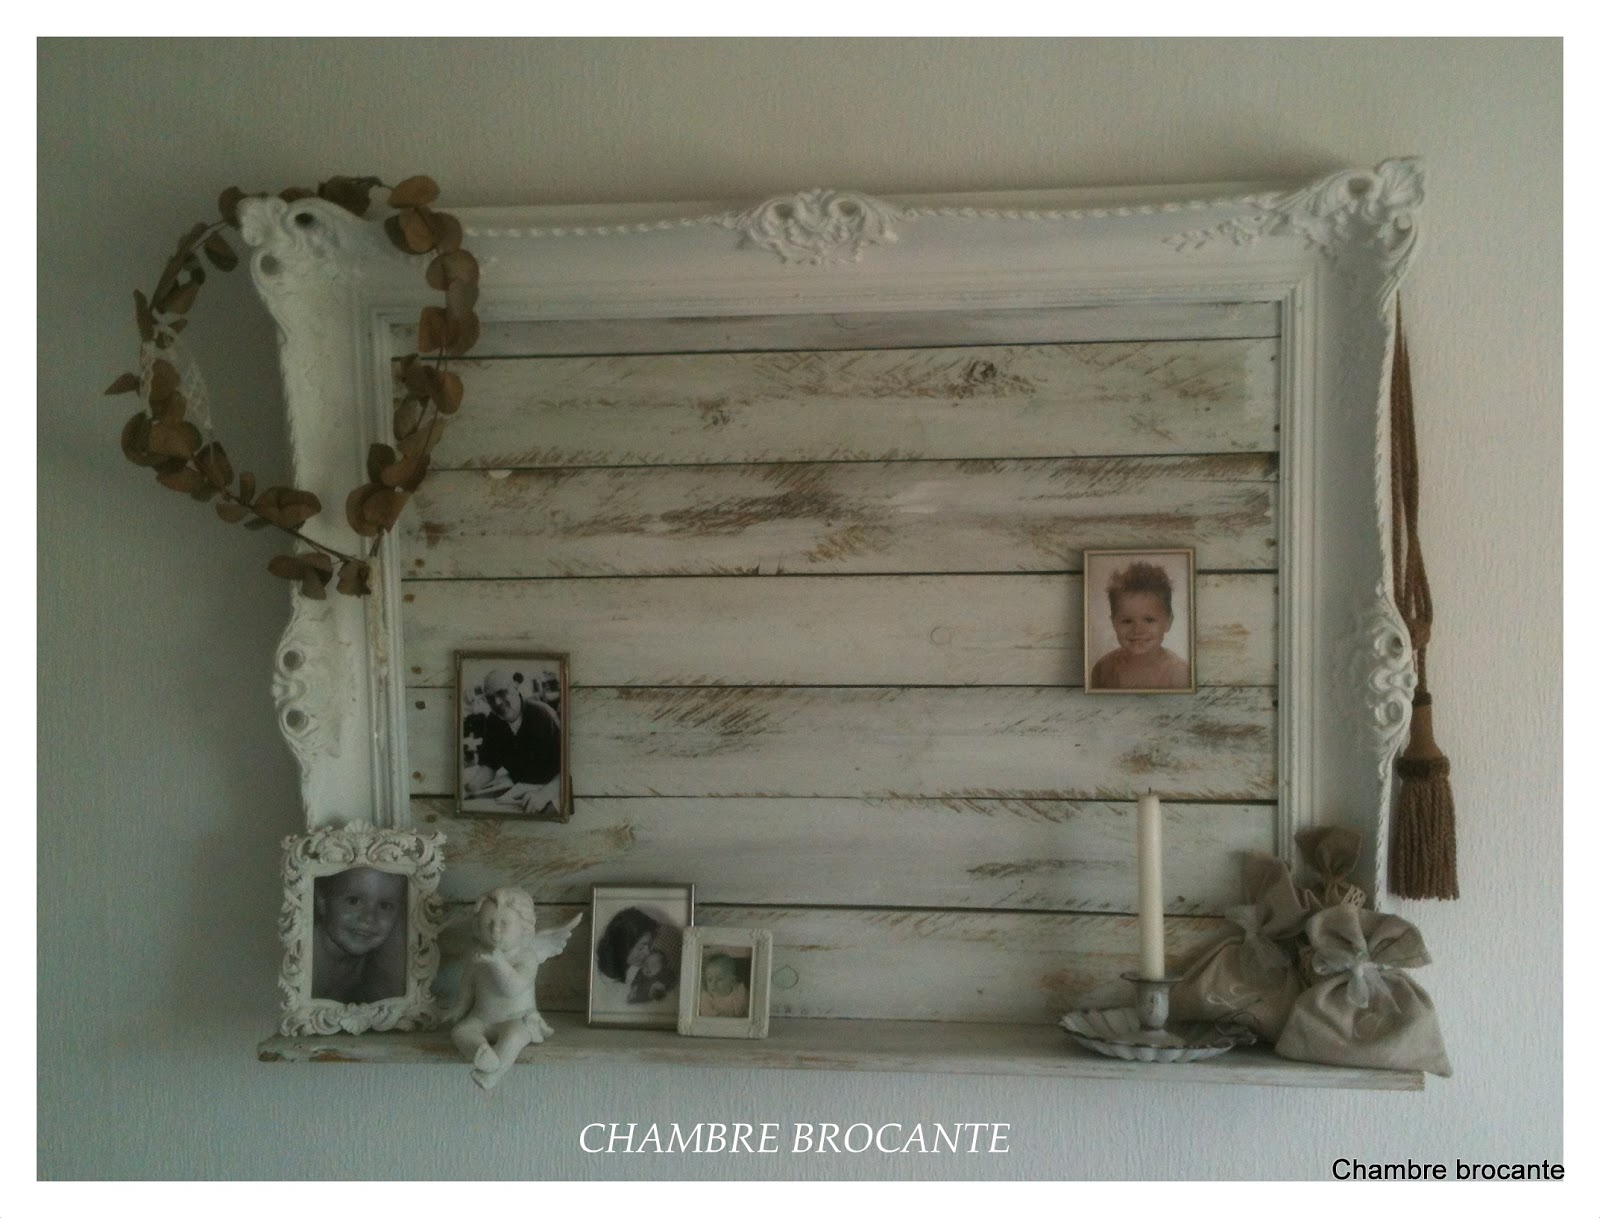 MARIANNE\'S CHAMBRE BROCANTE: Slaapkamer perikelen!